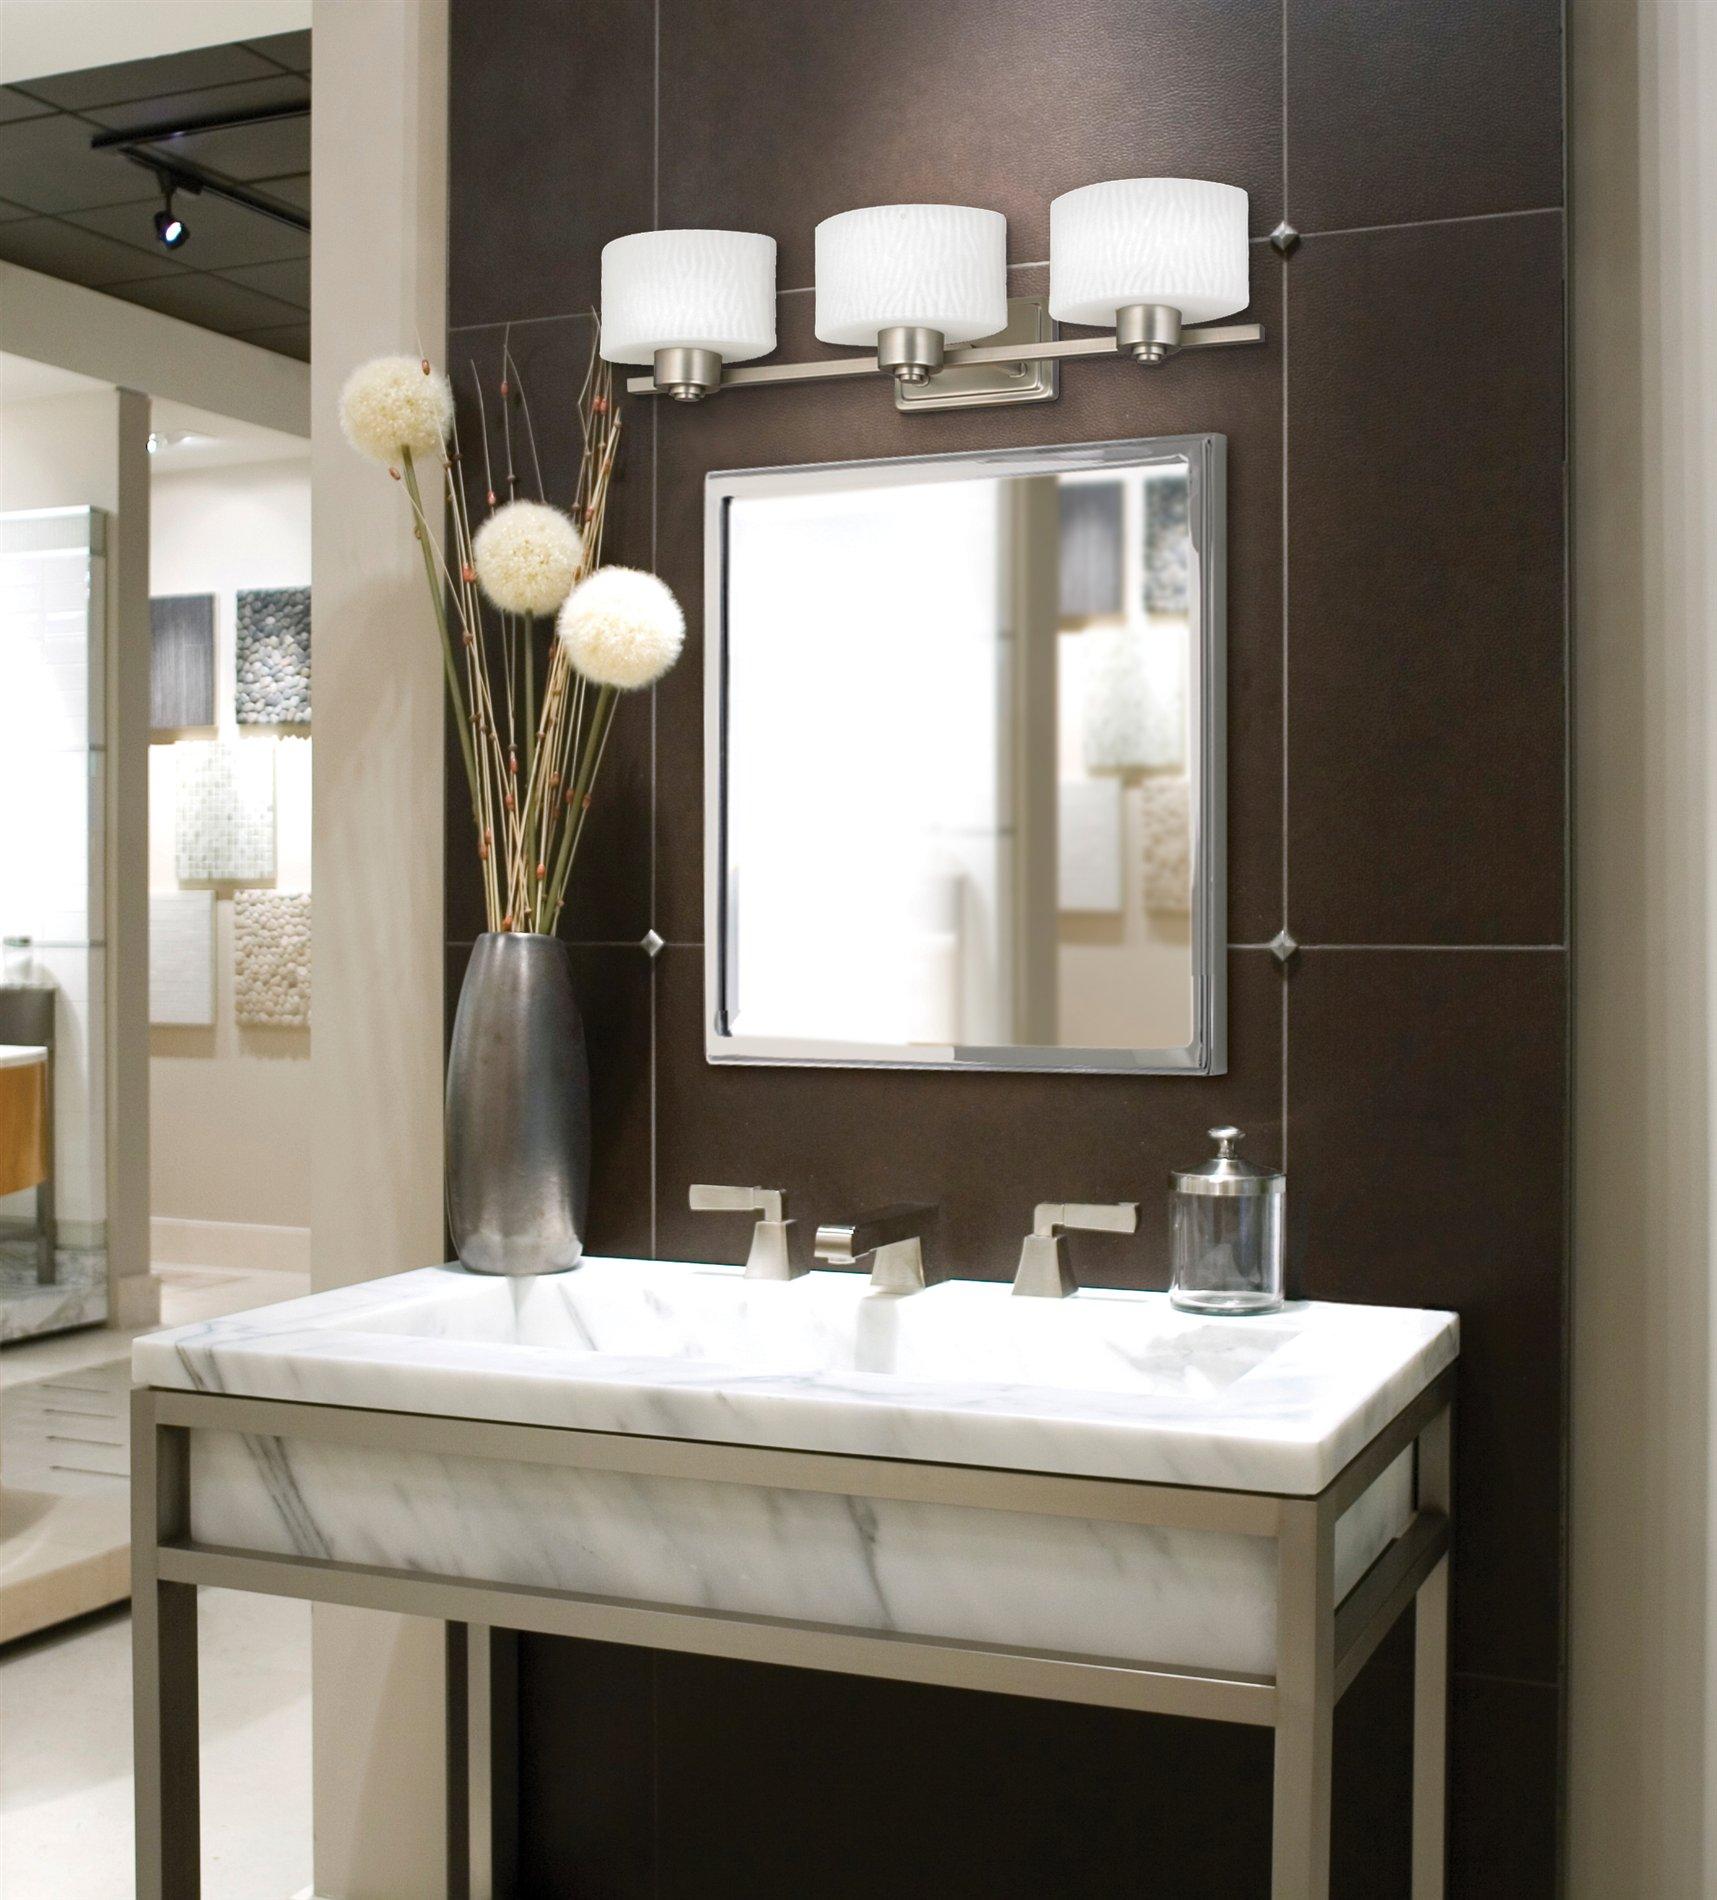 Bathroom Vanity Track Lighting wall mounted track lighting: distinctive style lighting choice